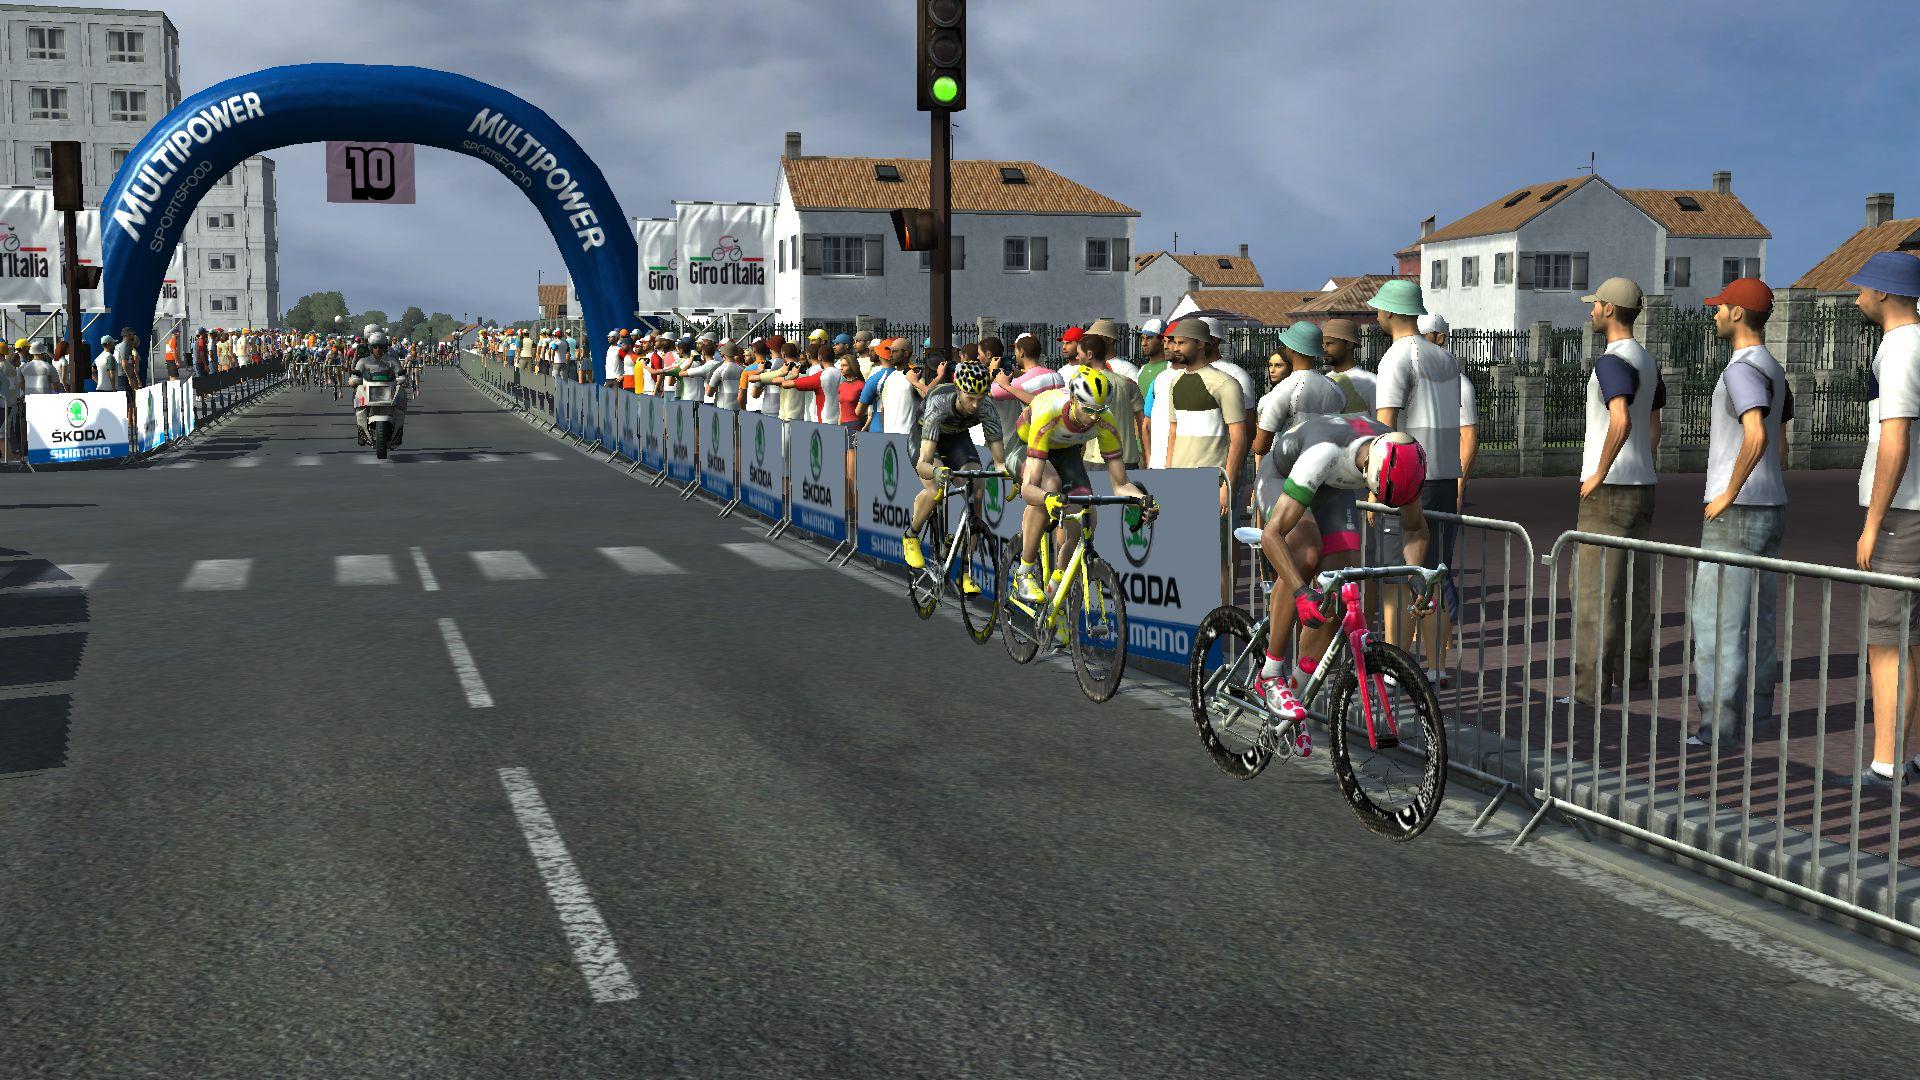 pcmdaily.com/images/mg/2018/Races/GTM/Giro/mg18_giro_07_PCM0083.jpg